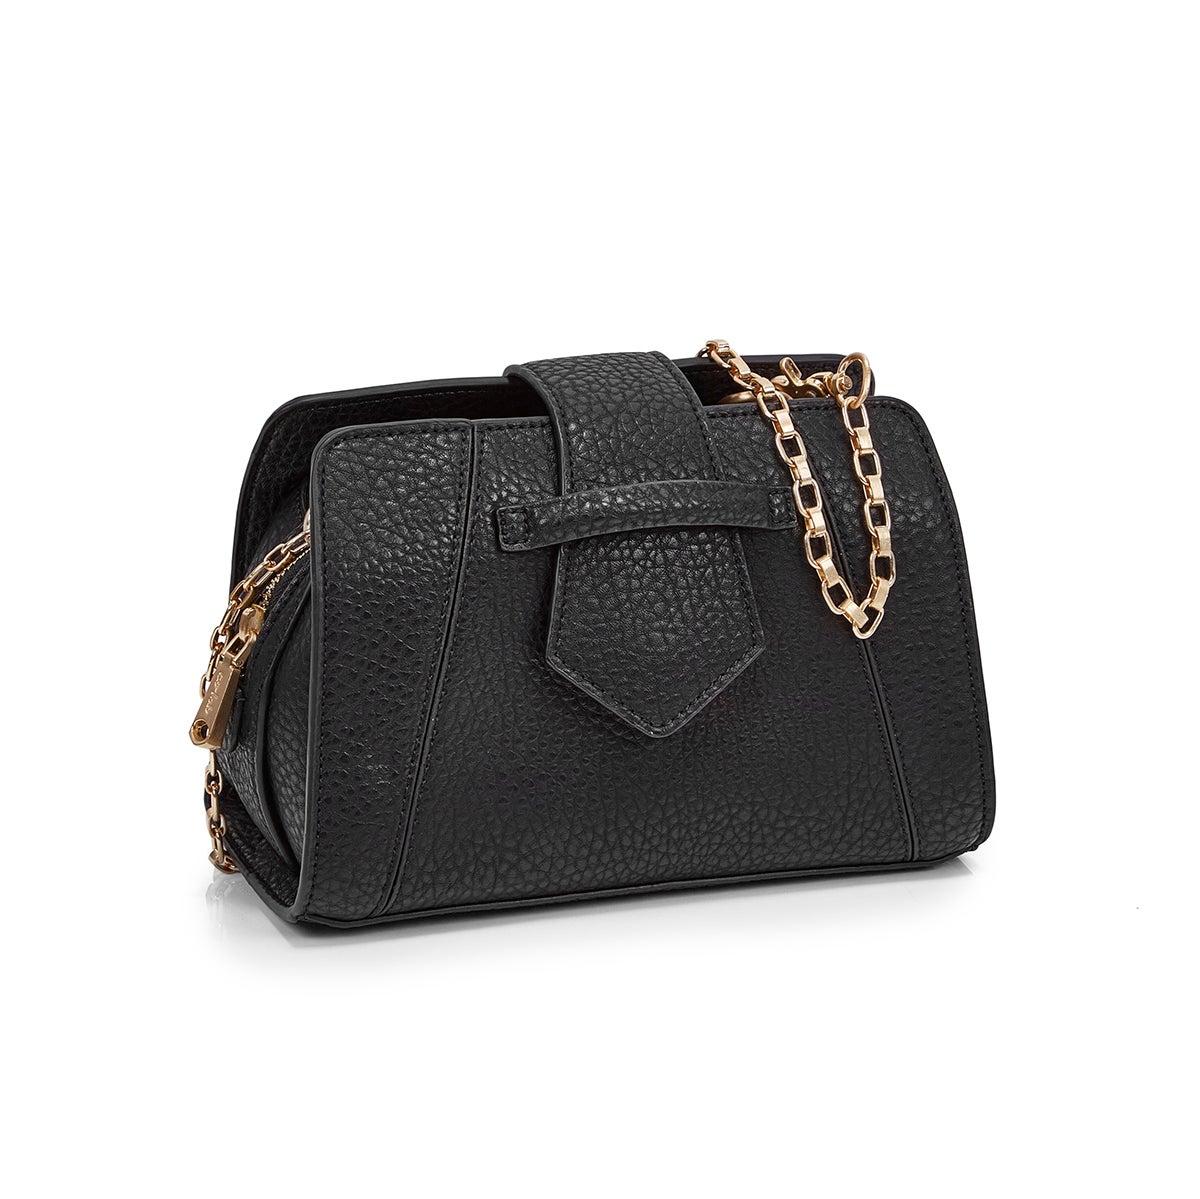 Women`s 5604 MINI SADDLE black cross body bag